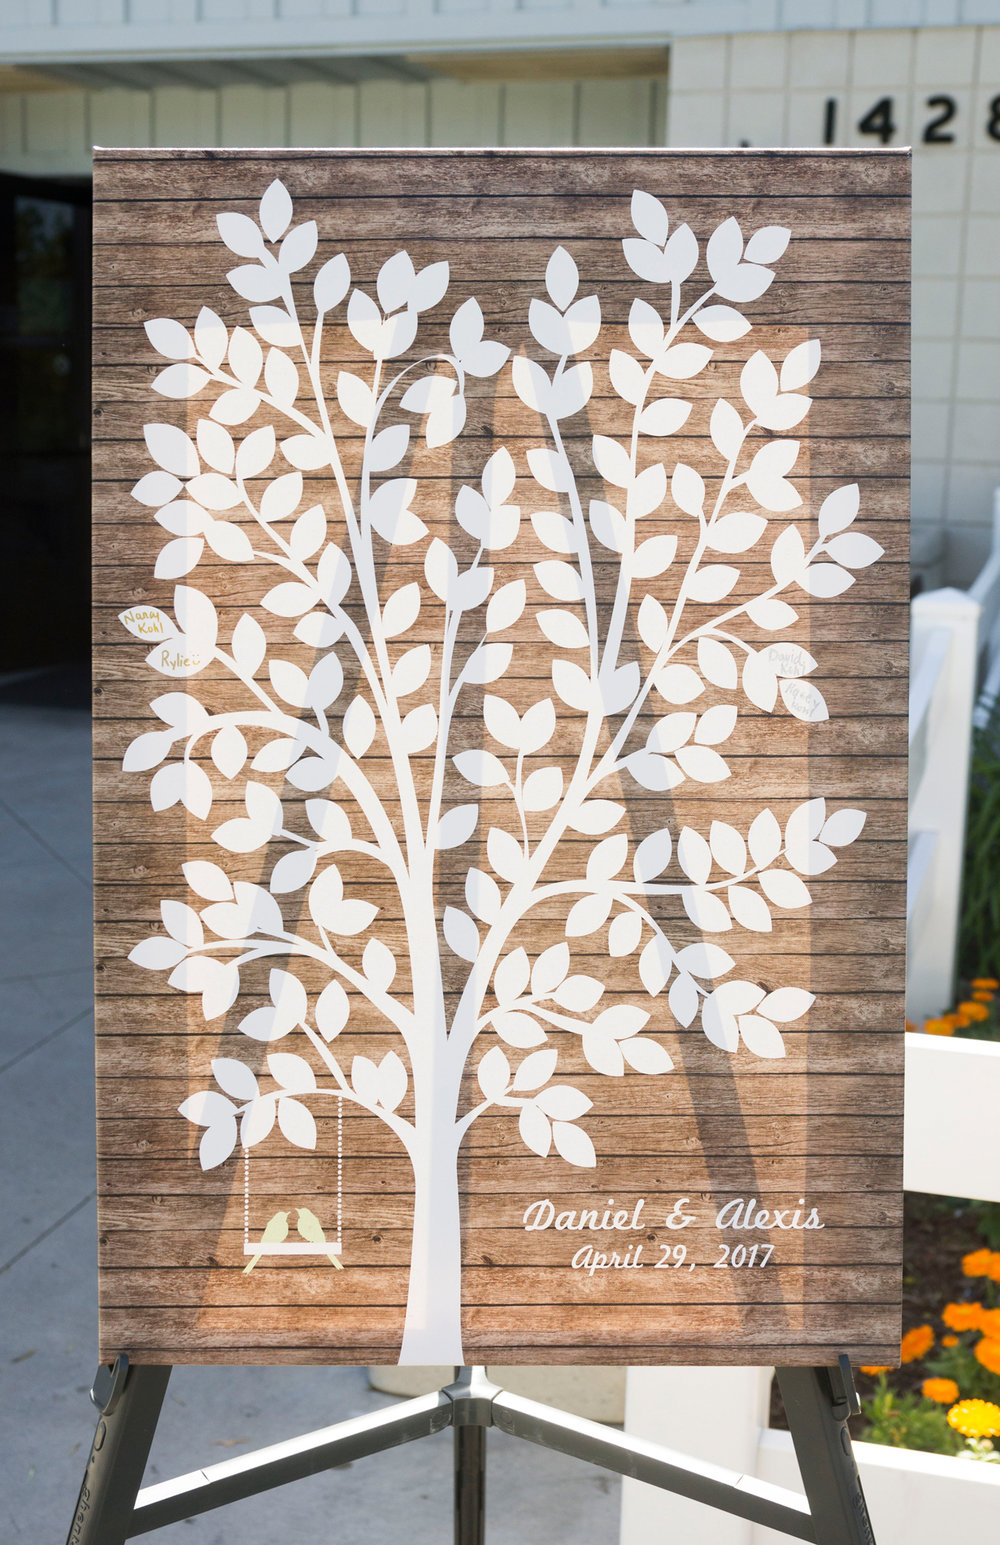 Wooden Guest Book Alternative - McCoy Equestrian Center Wedding - Peterson Design & Photography